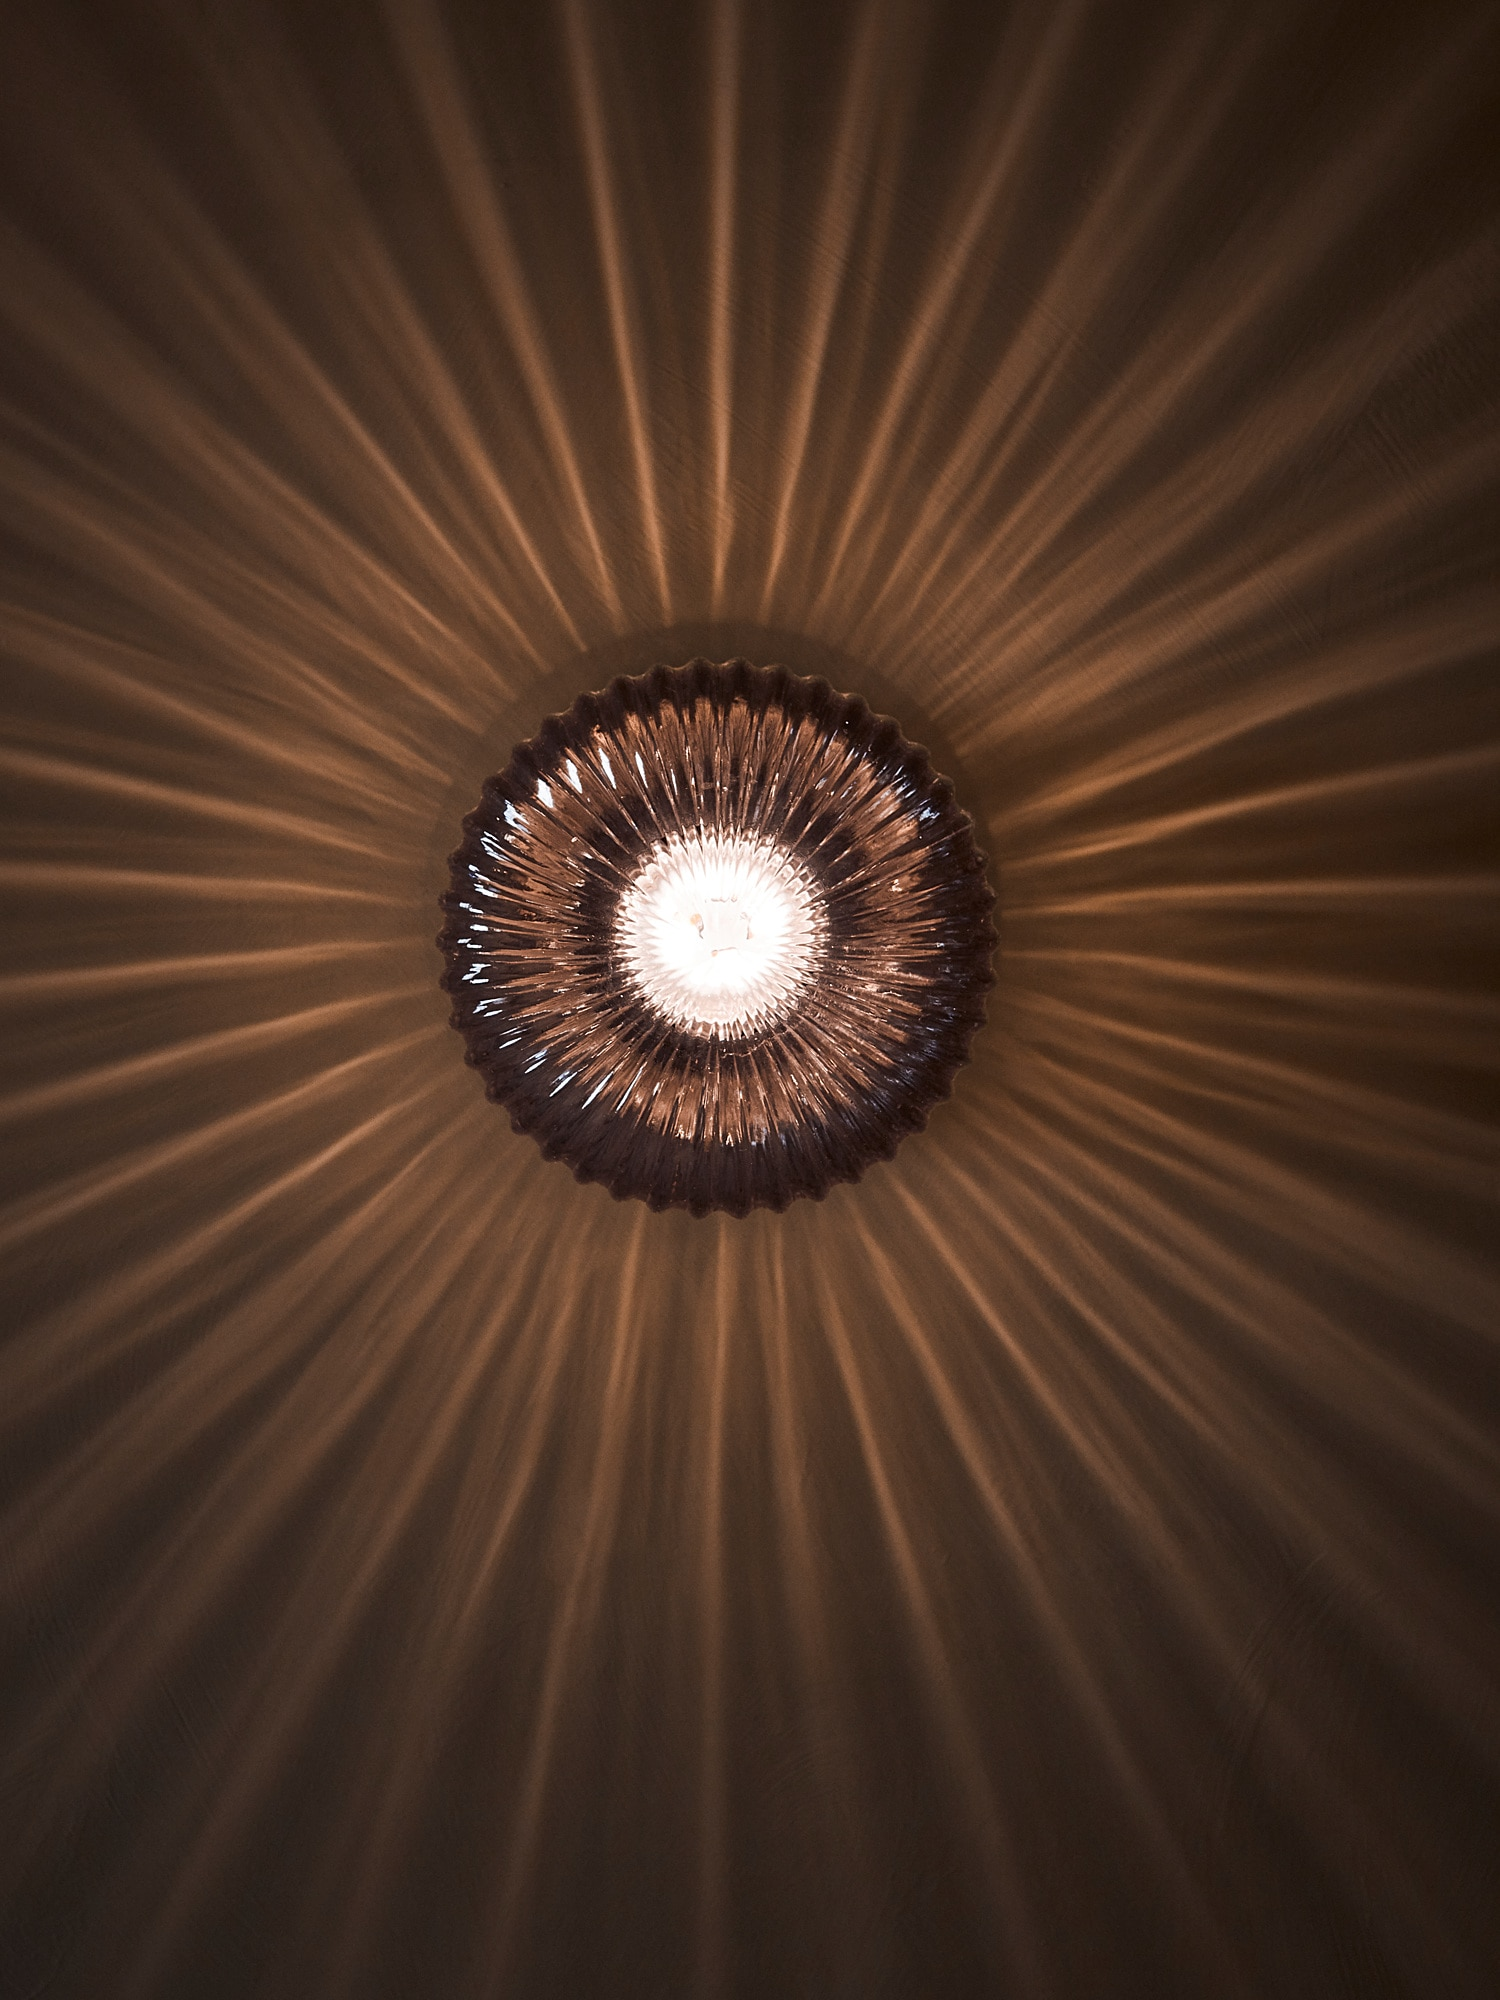 SOLKLINT Vegglampe messinggrått klart glass IKEA